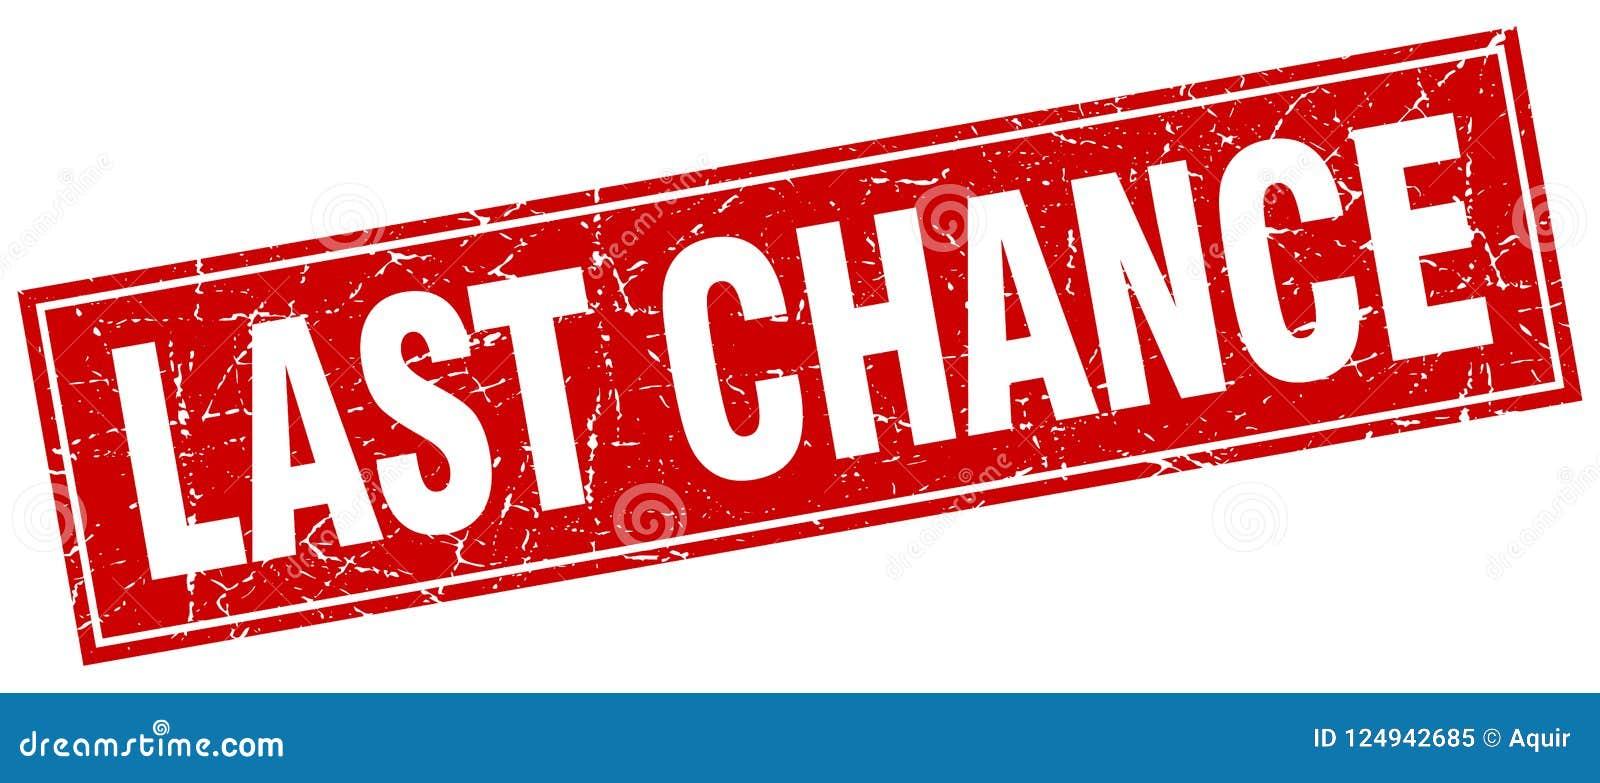 last chance stamp